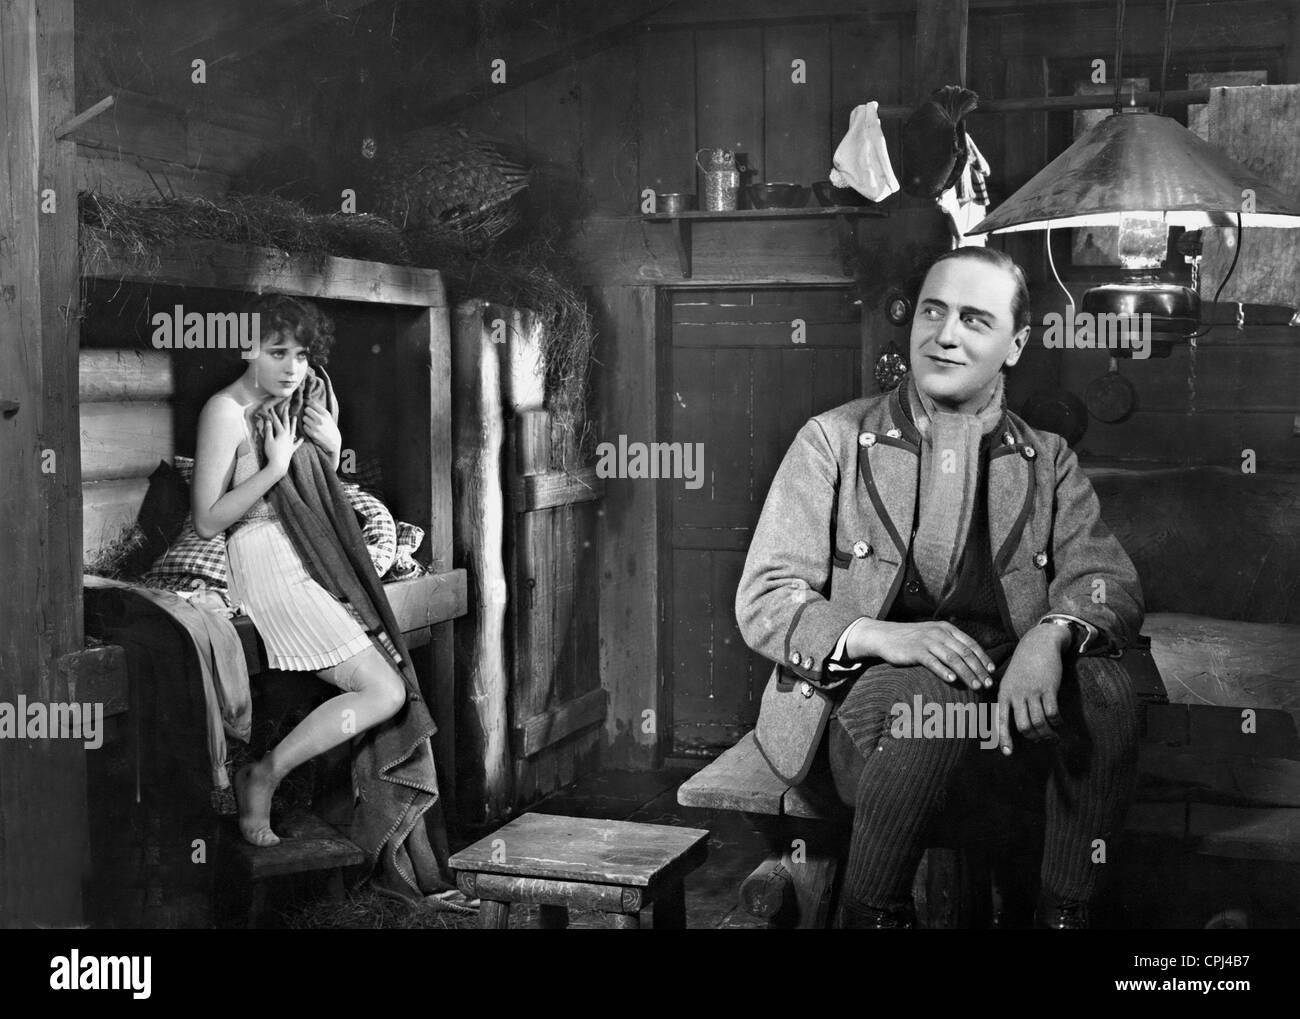 Harry Liedtke in 'Amor auf Ski', 1928 - Stock Image